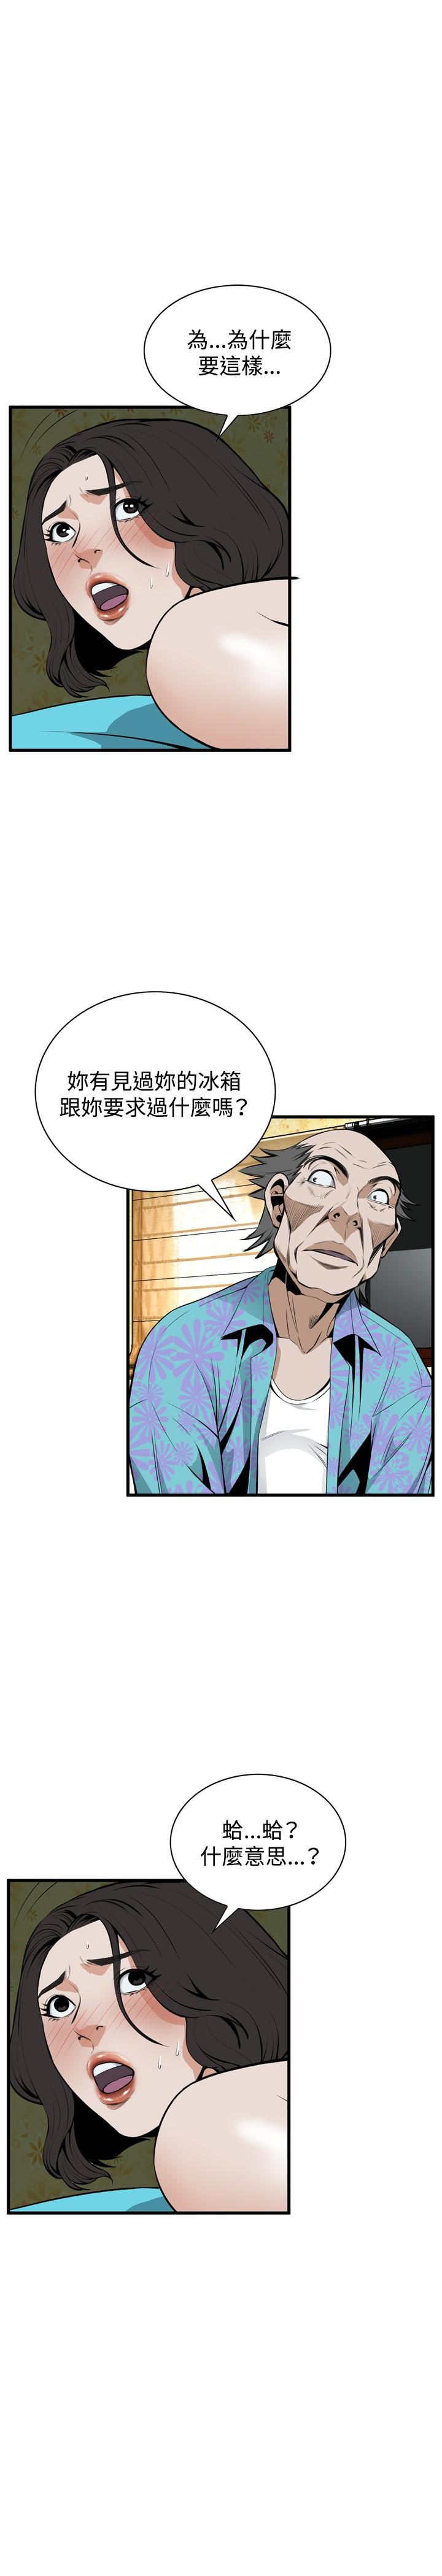 Take a Peek 偷窥 Ch.39~60 [Chinese]中文 131